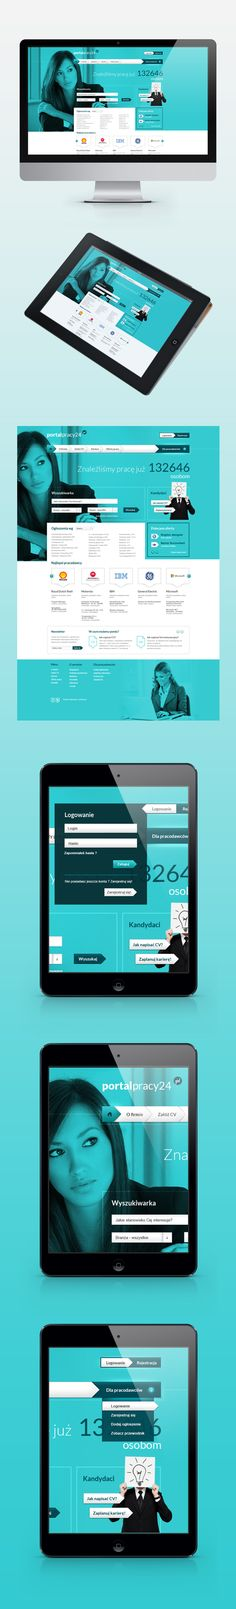 Portalpracy24.pl - Job Portal by Adam Rozmus, via #Behance #Webdesign